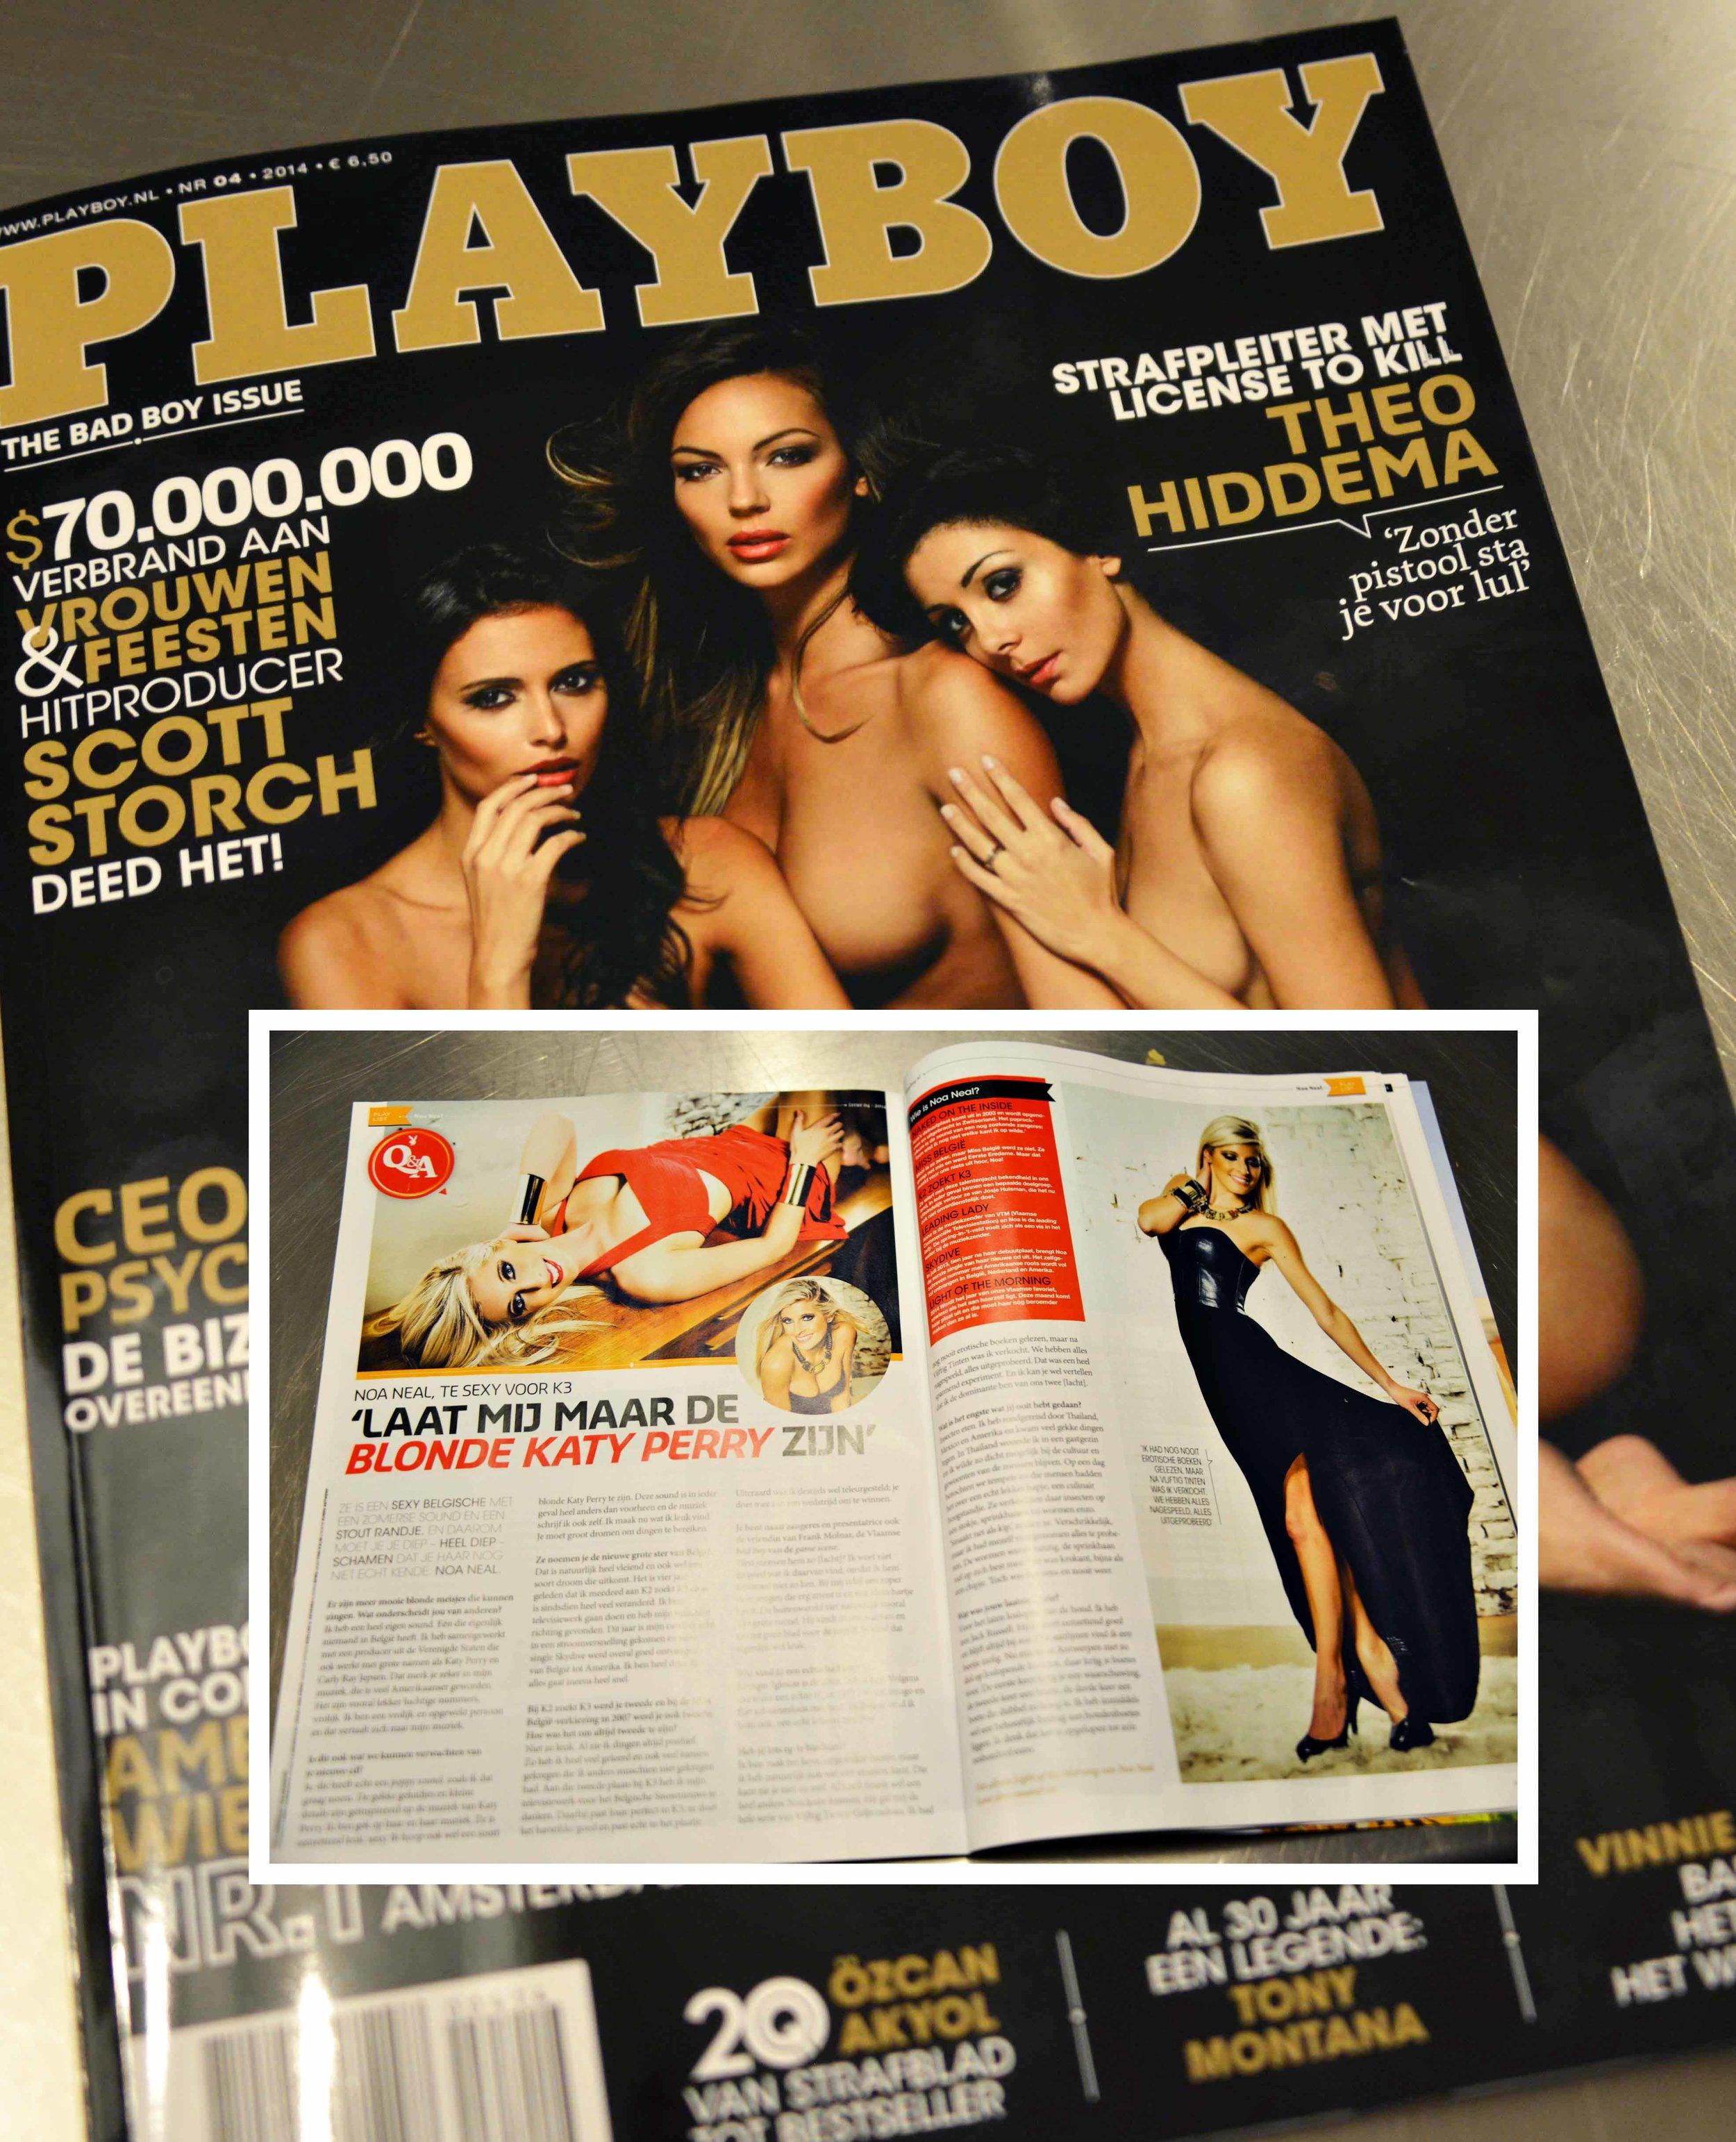 bart albrecht fotograaf photographer belgium p magazine che playboy editorial magazines glamour boudoir daniela degraux kelly buytaert 0011.jpg